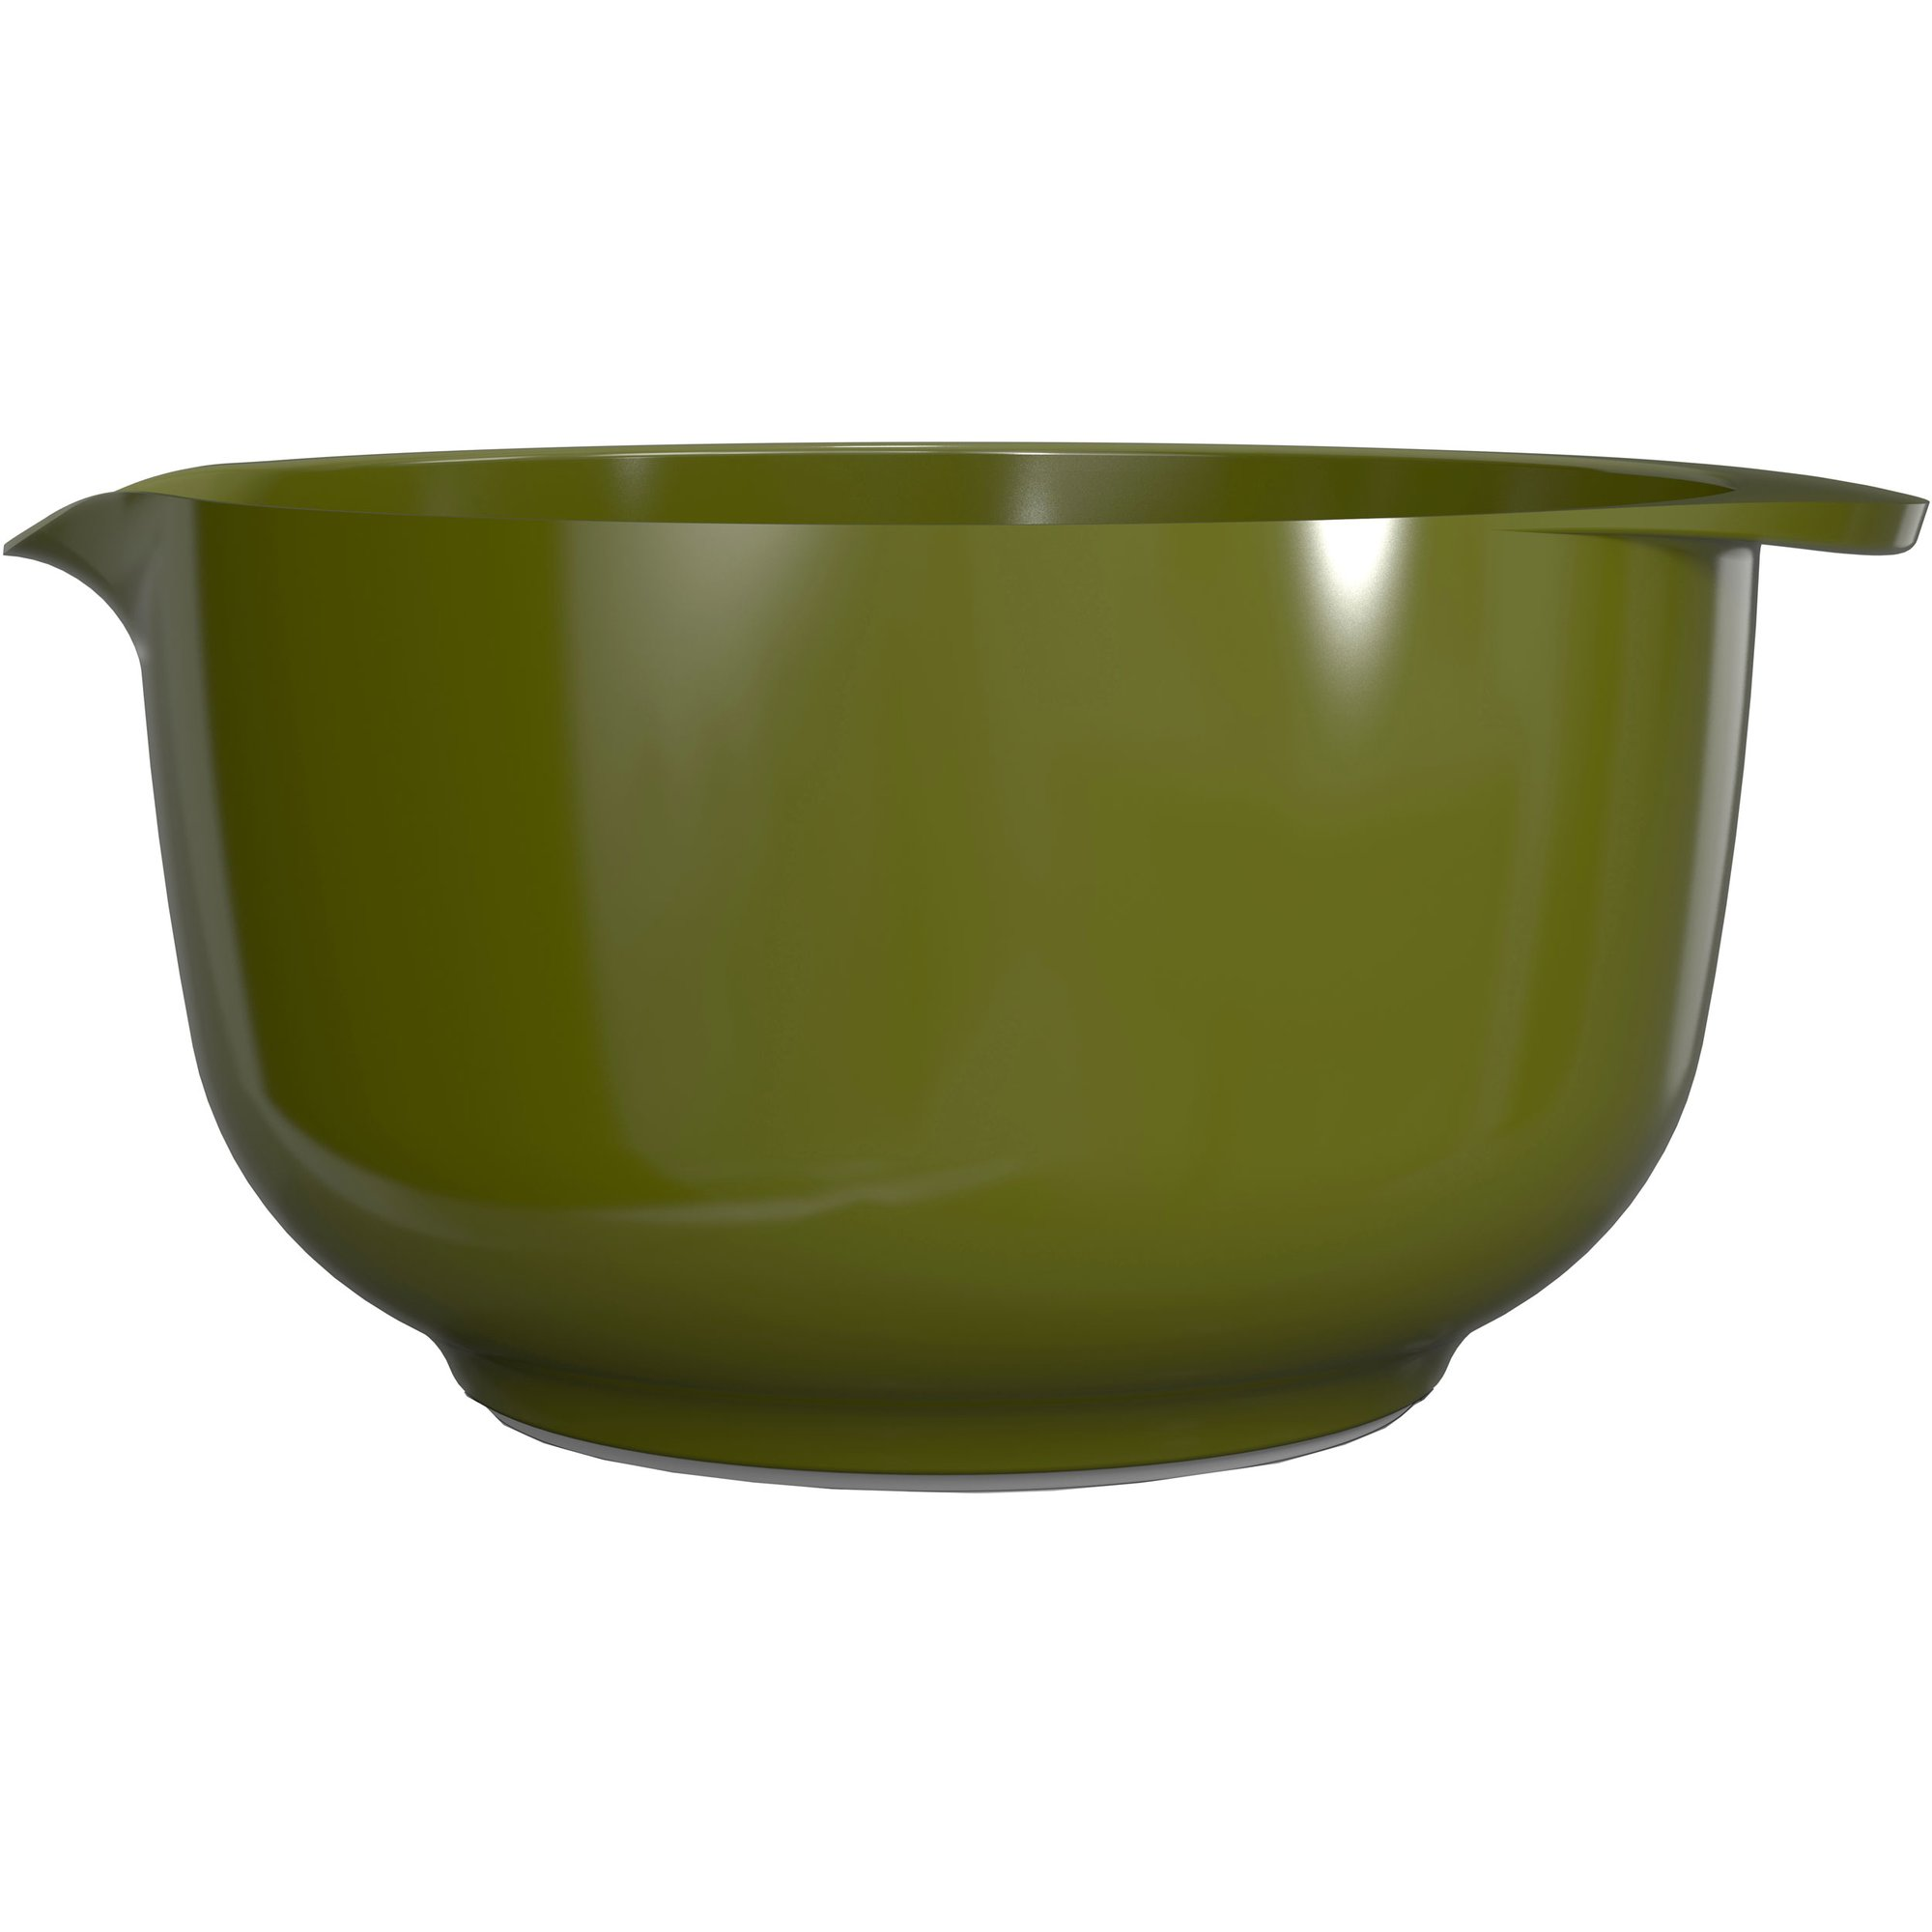 Rosti Mepal Margrethe Skål 4L Olivgrön